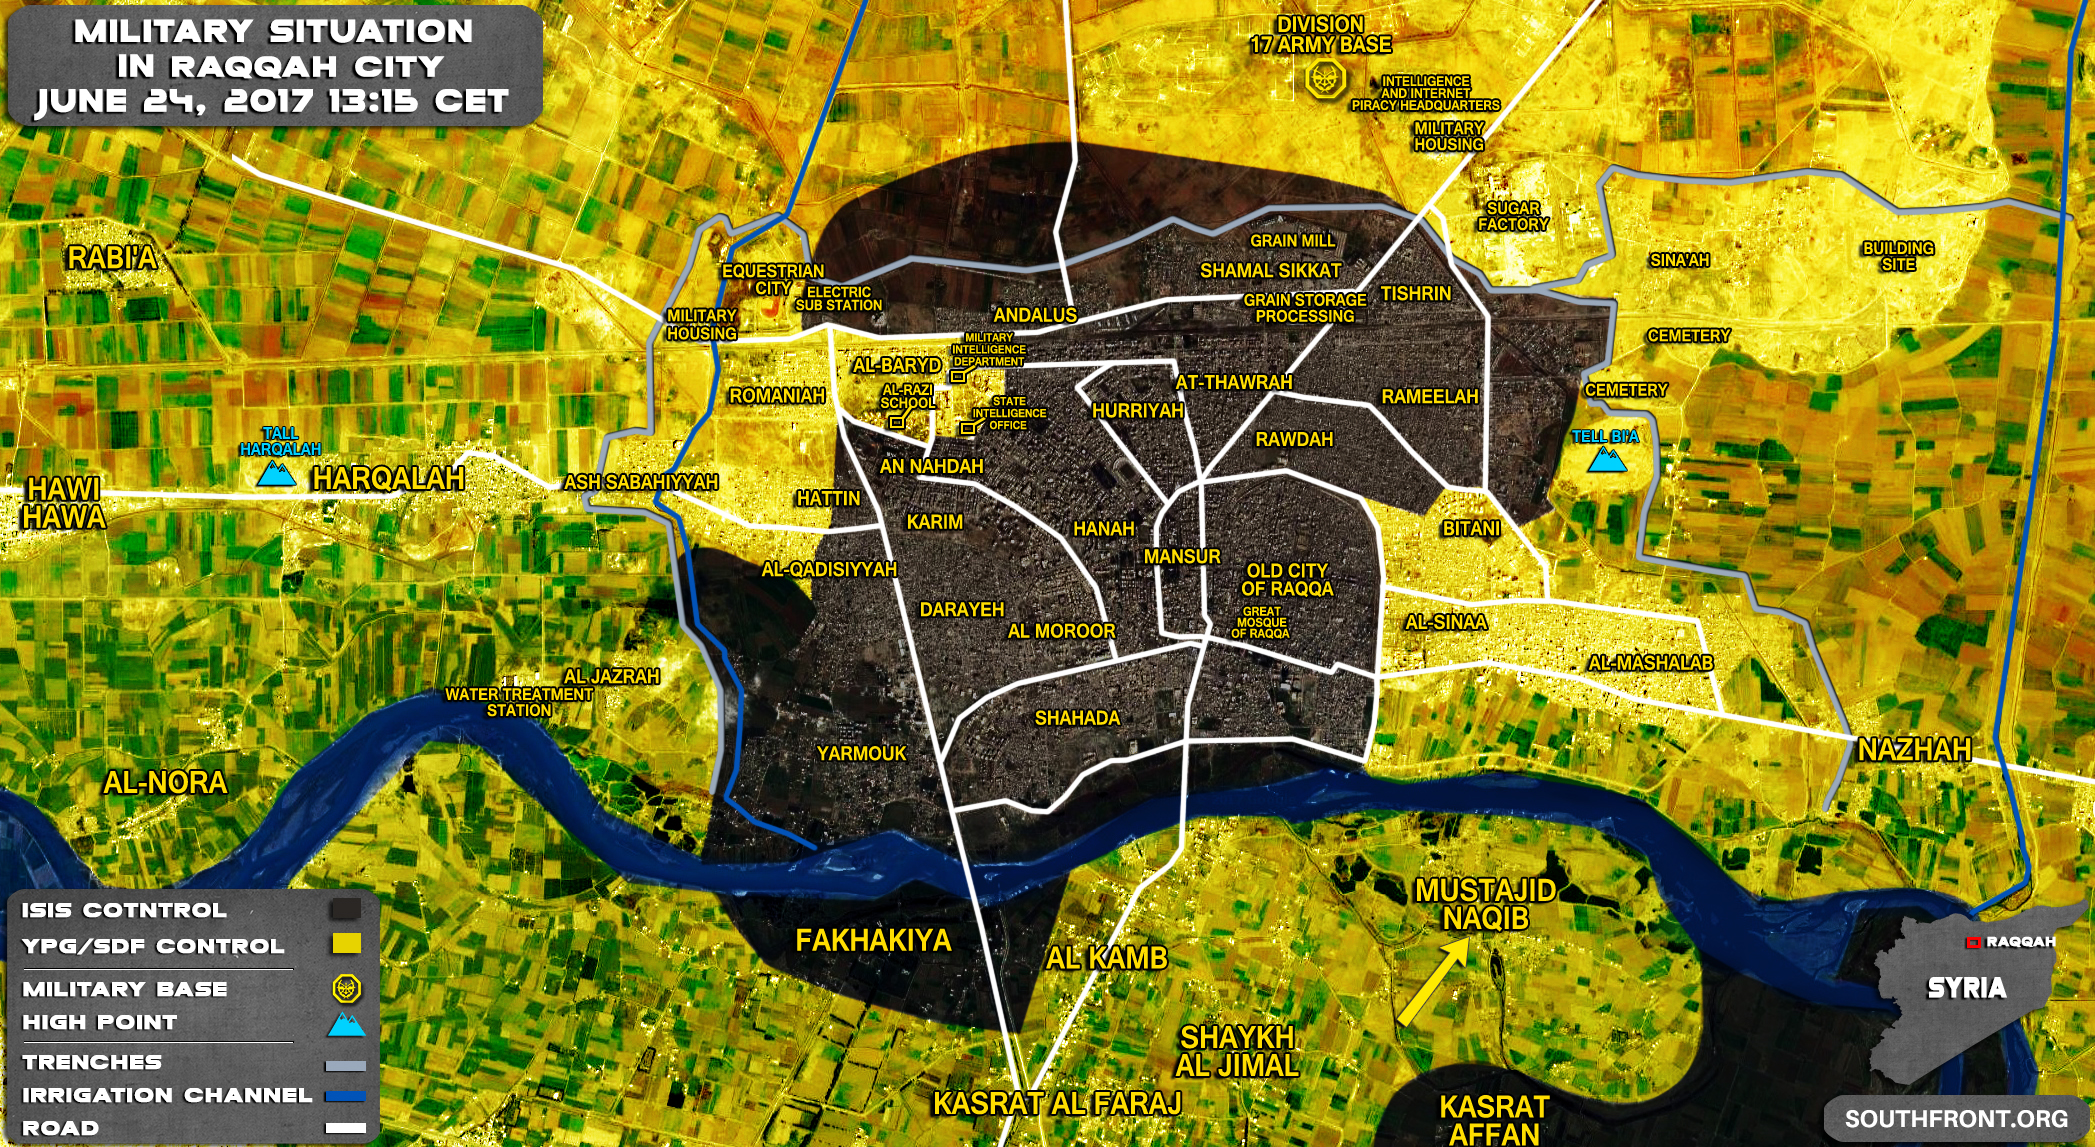 SDF Seizes Mustajid Naqib, Fully Encircles Raqqah City (Map)